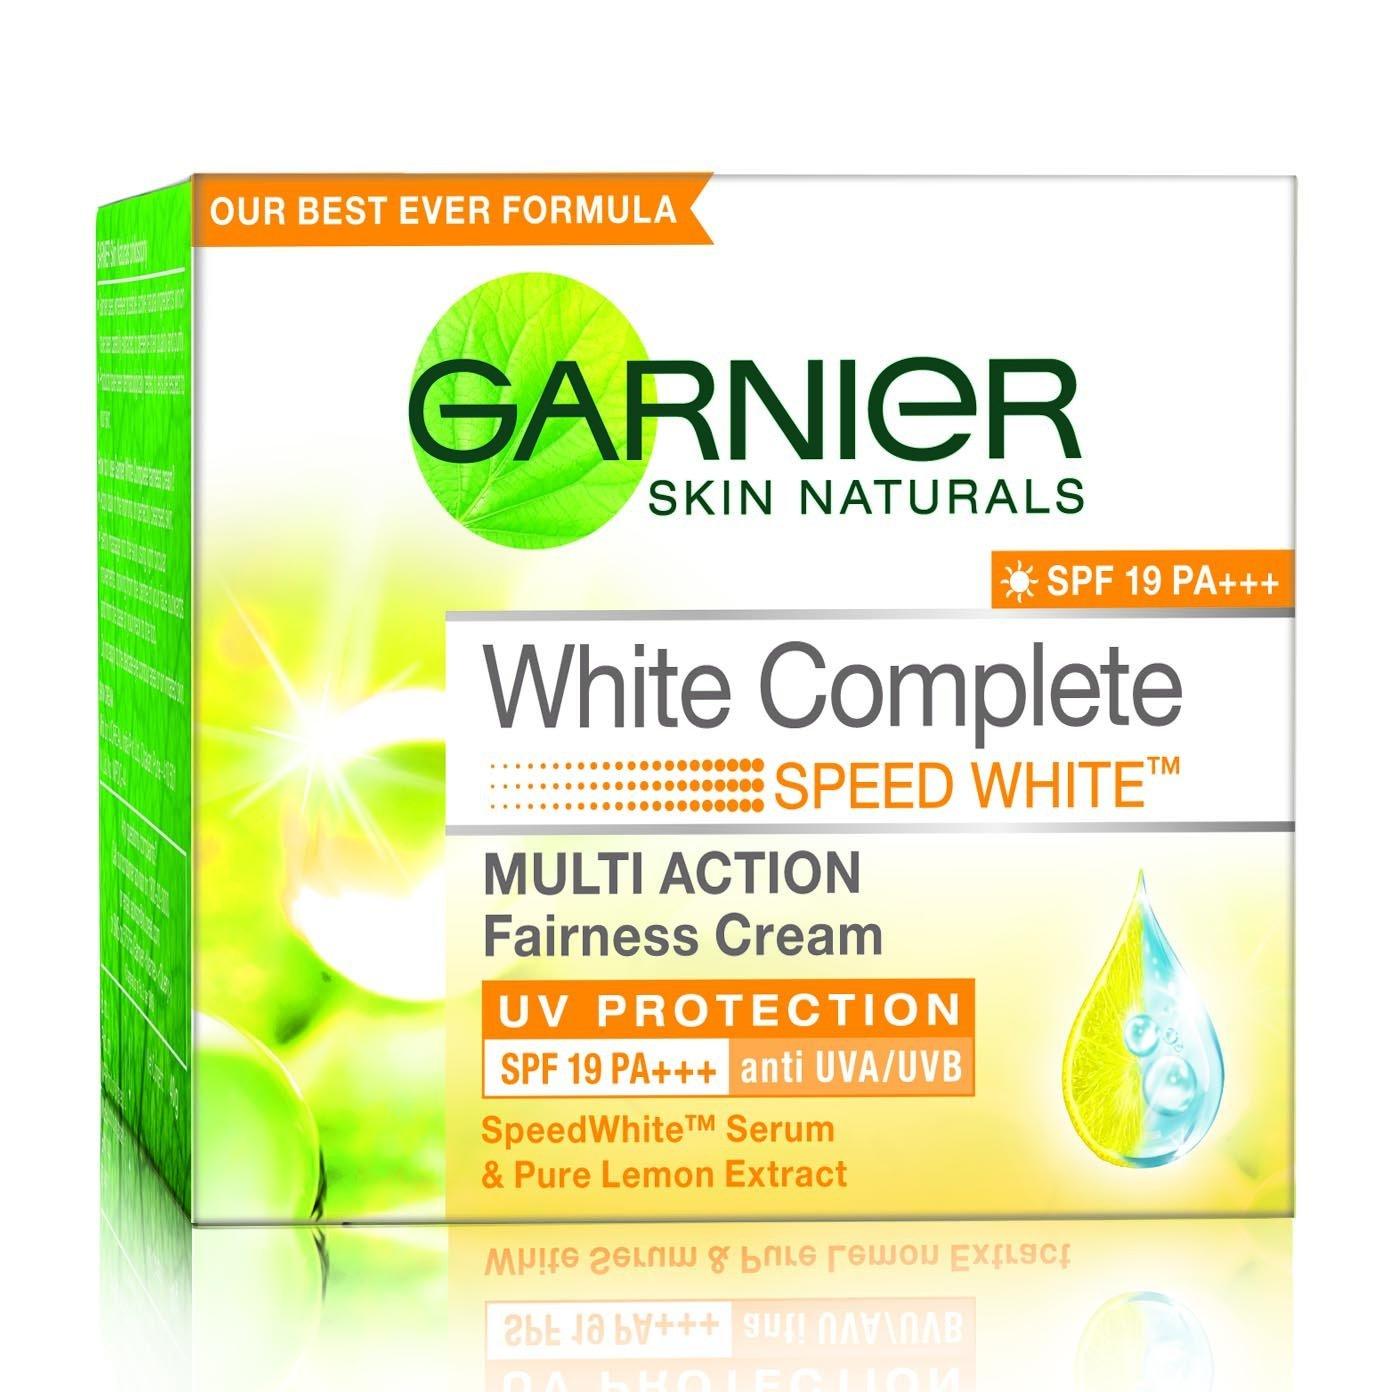 Garnier Skin Naturals White Complete Multi Action Fairness Cream Image